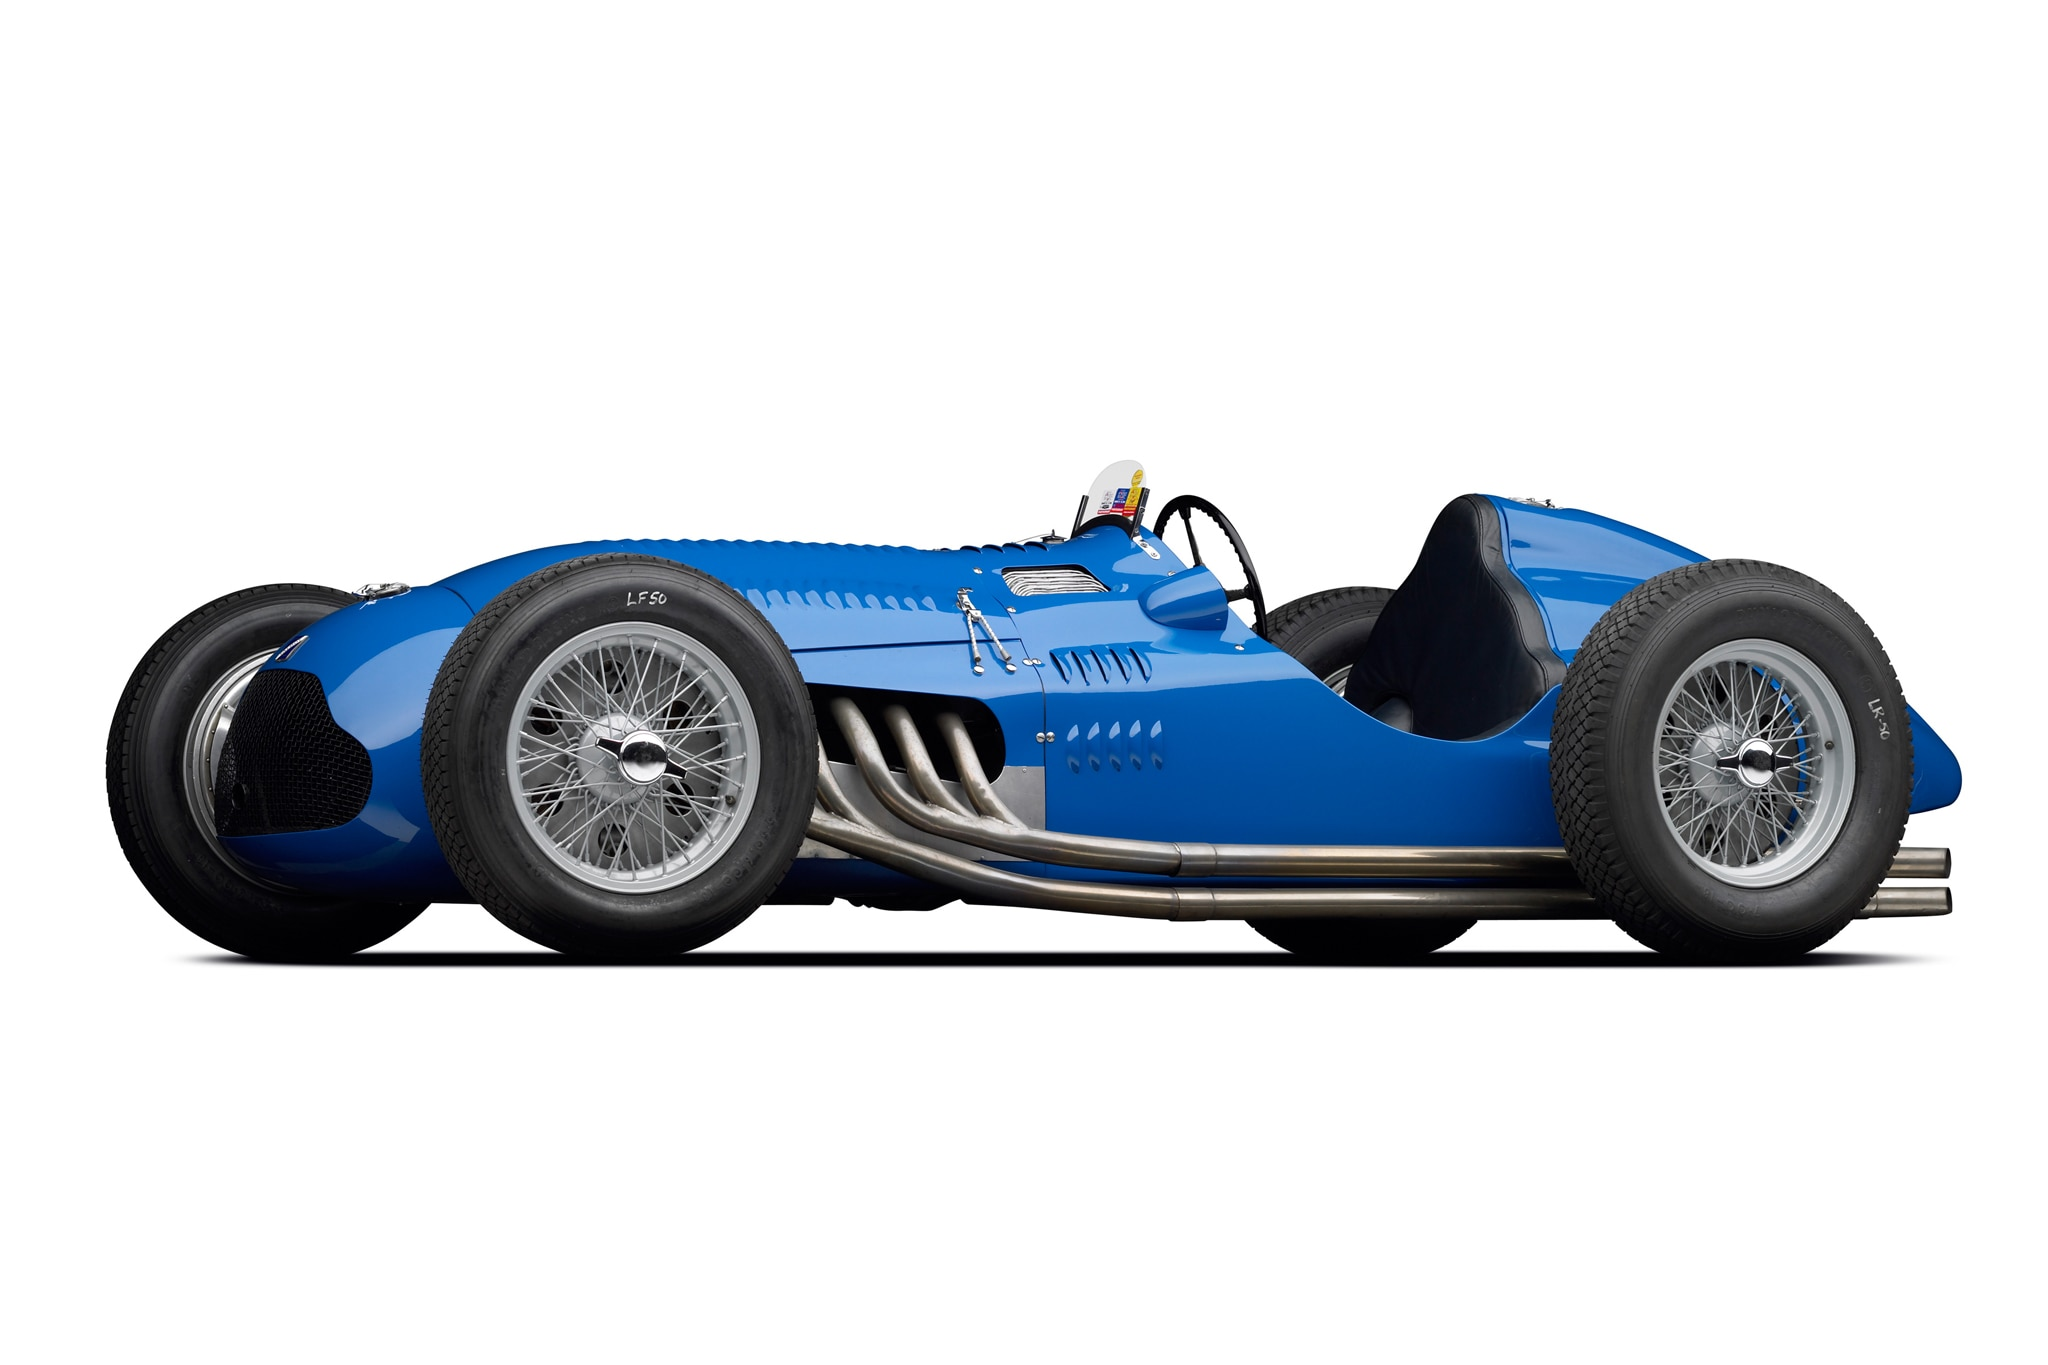 The Mullin to Bring Six Bugatti, Leon, and Delage Classic Cars to ...